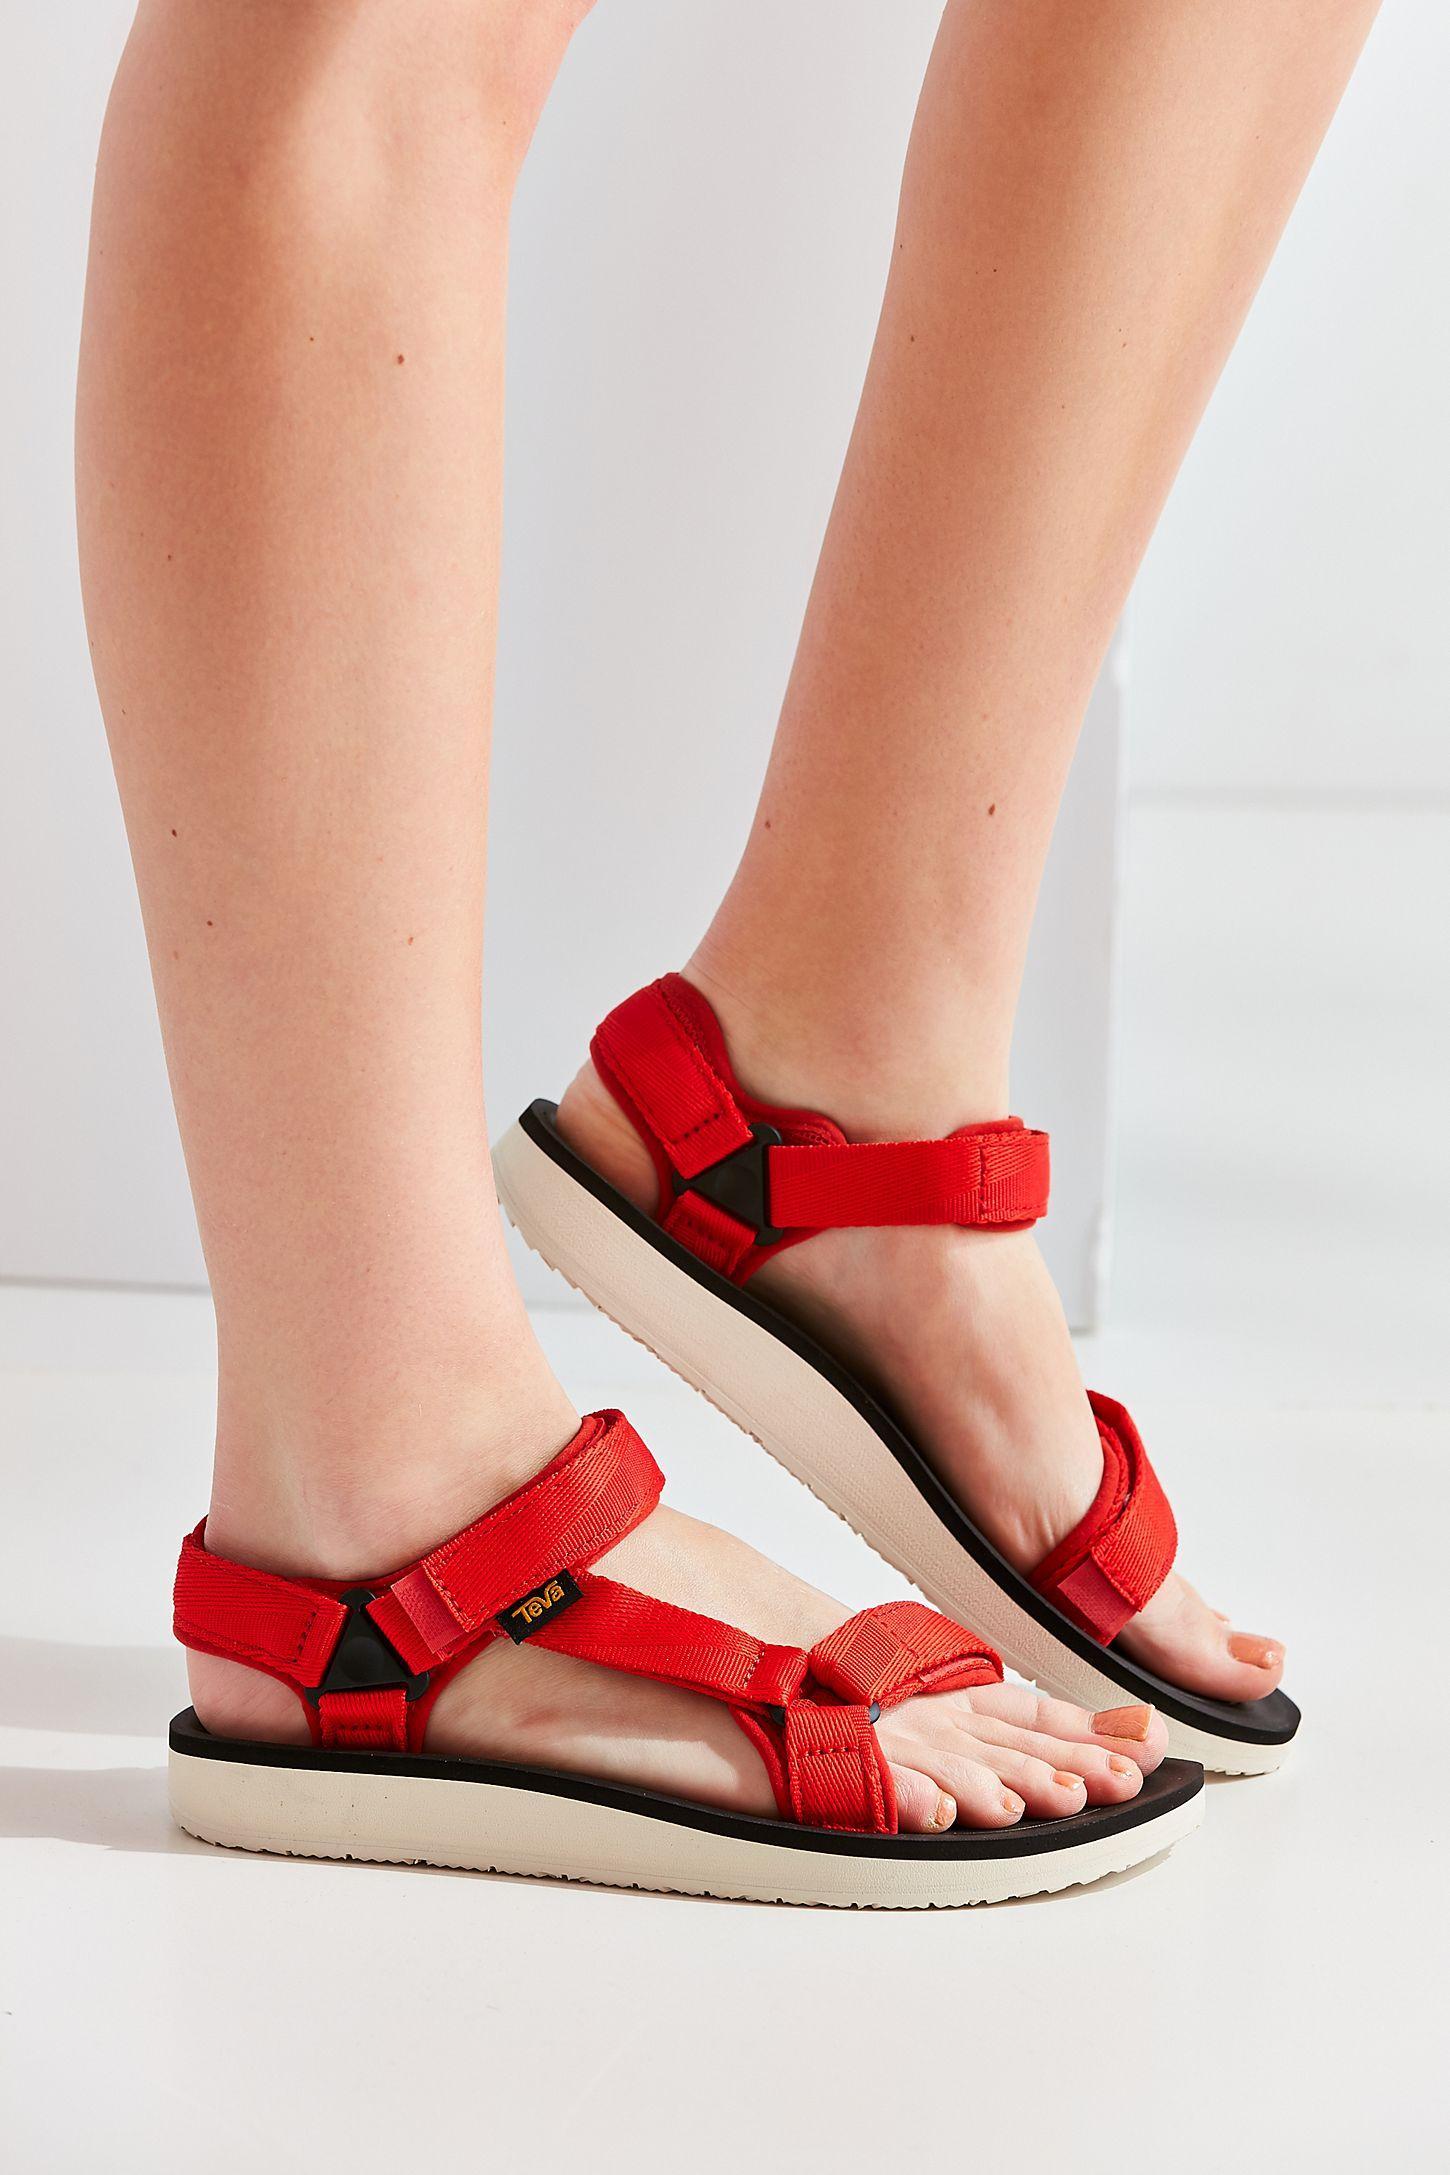 b5ca4eba4b63 Teva Original Universal Premier Sandal